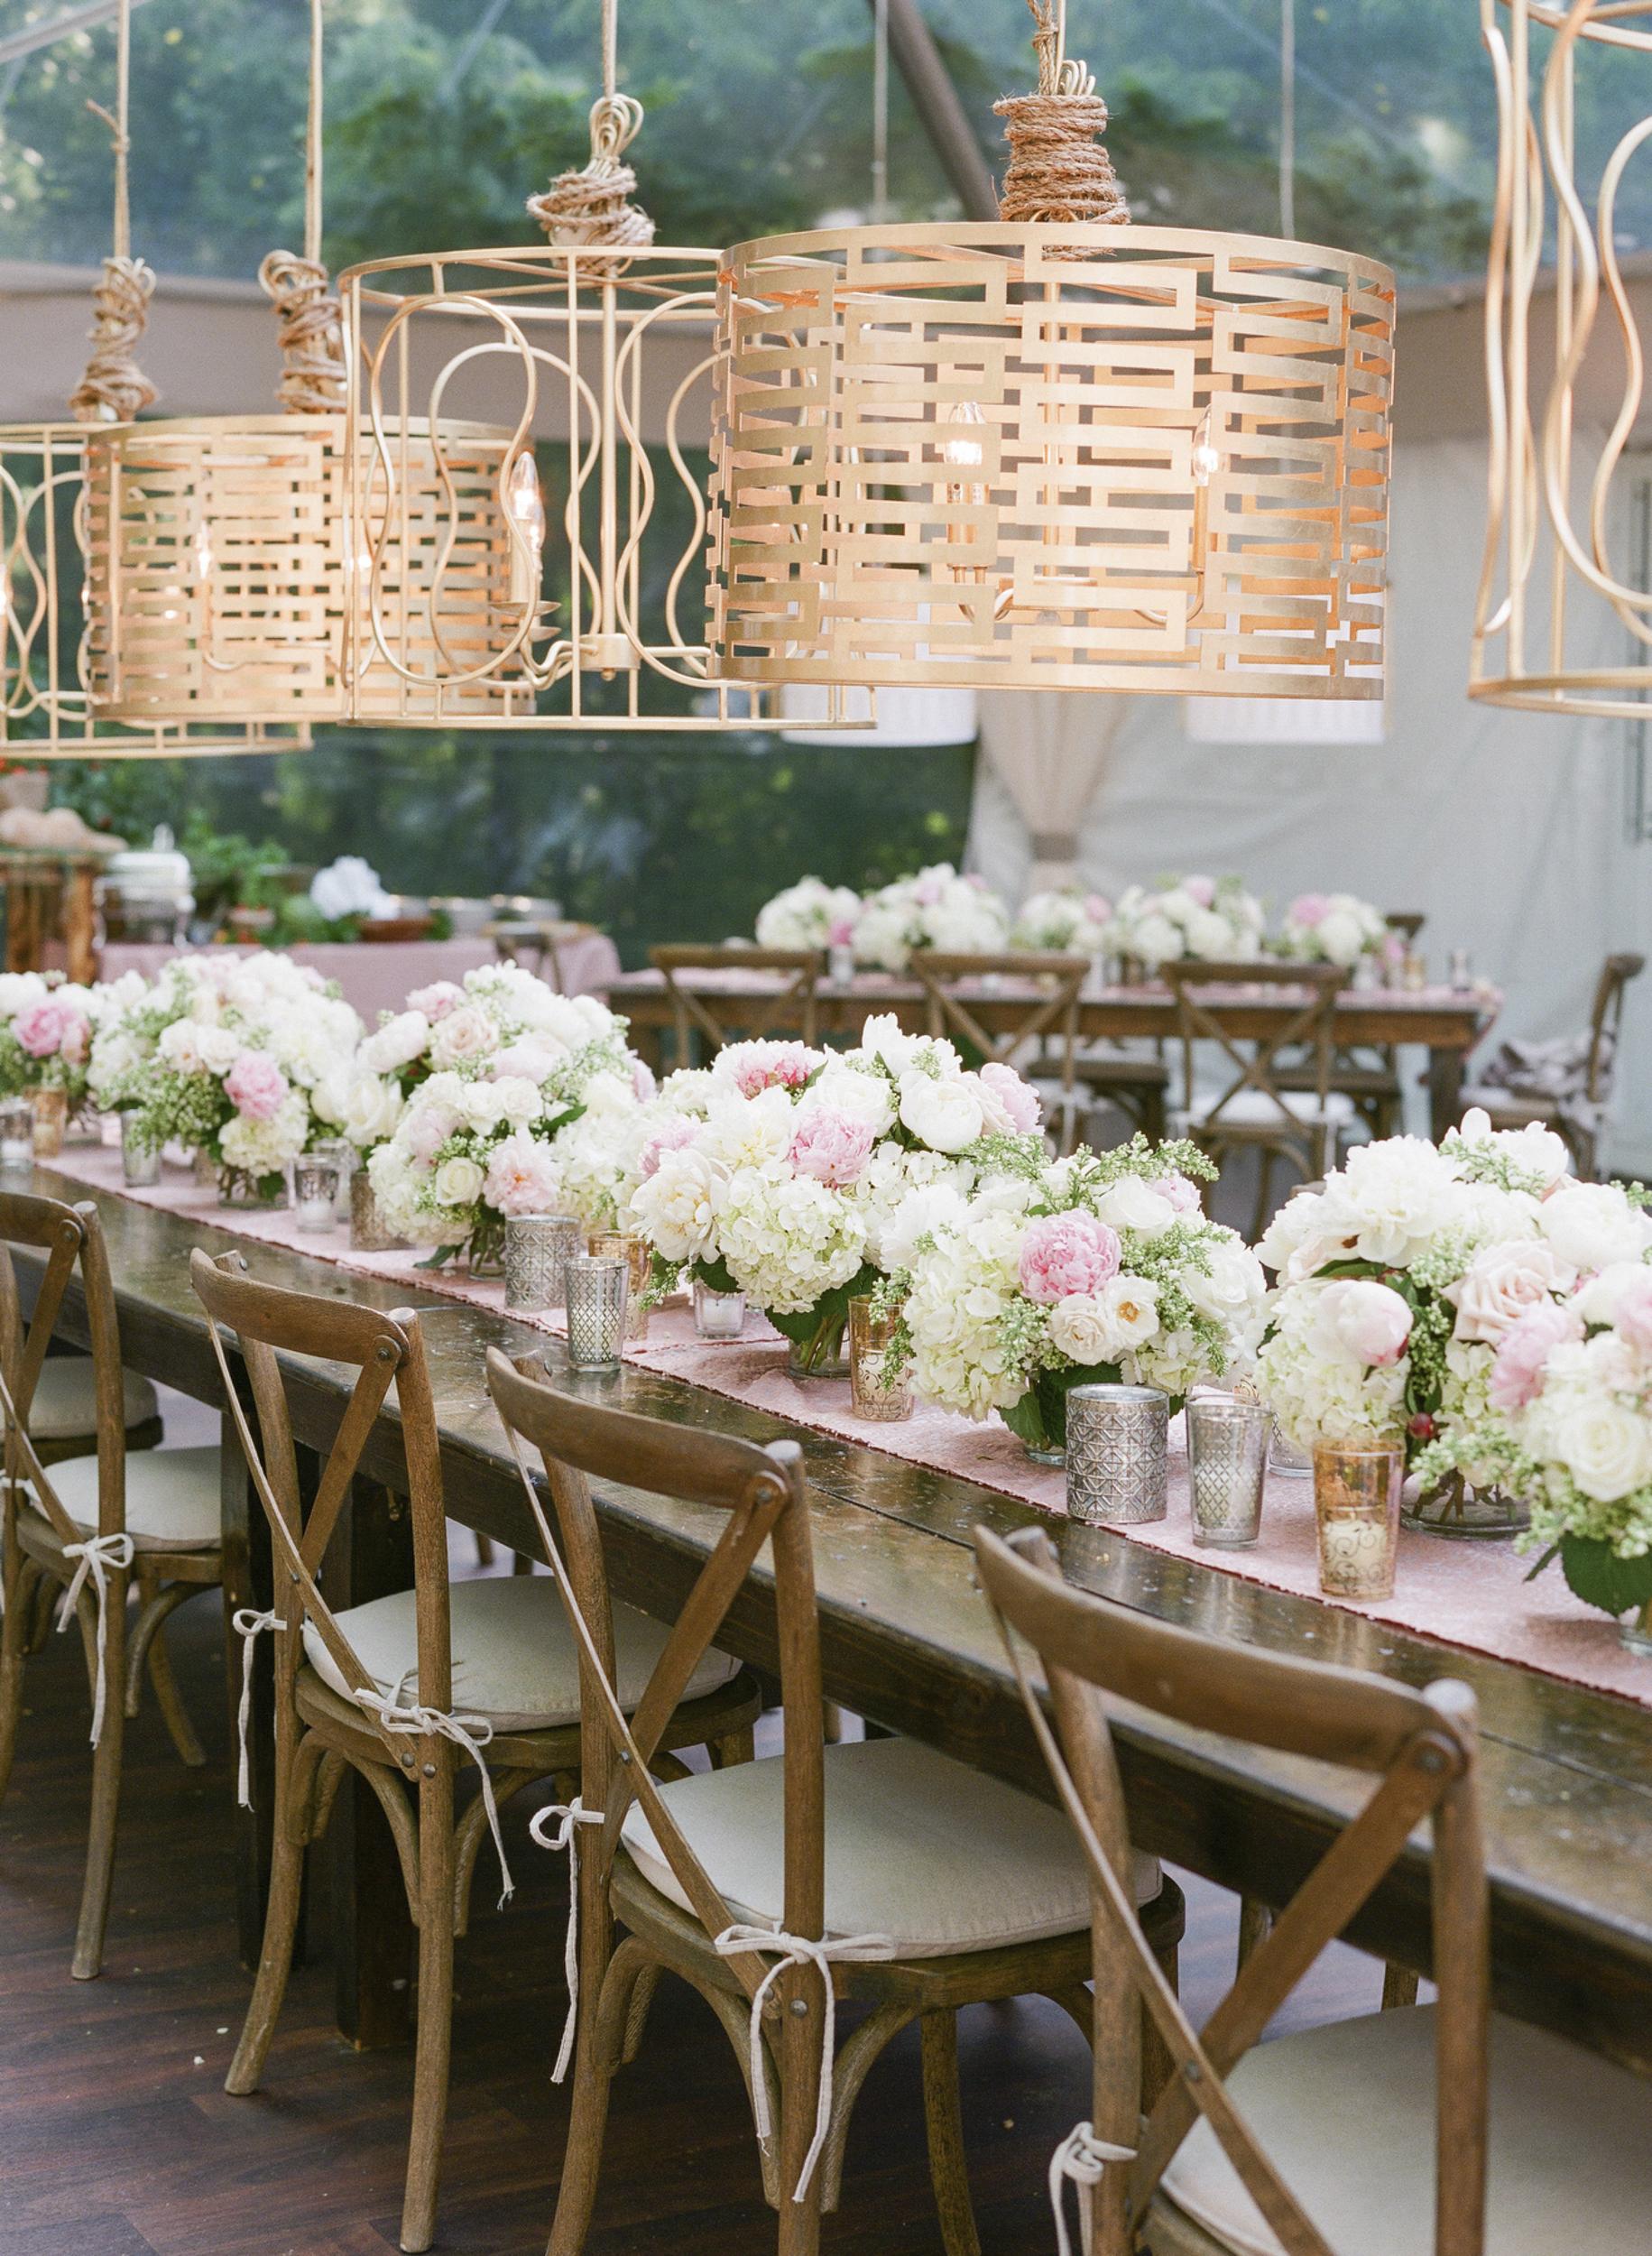 south_carolina_farm_wedding_rustic_chic_surprise_secret_luxe_wedding_bachelorette_emily_maynard_real_weddings-3.jpg